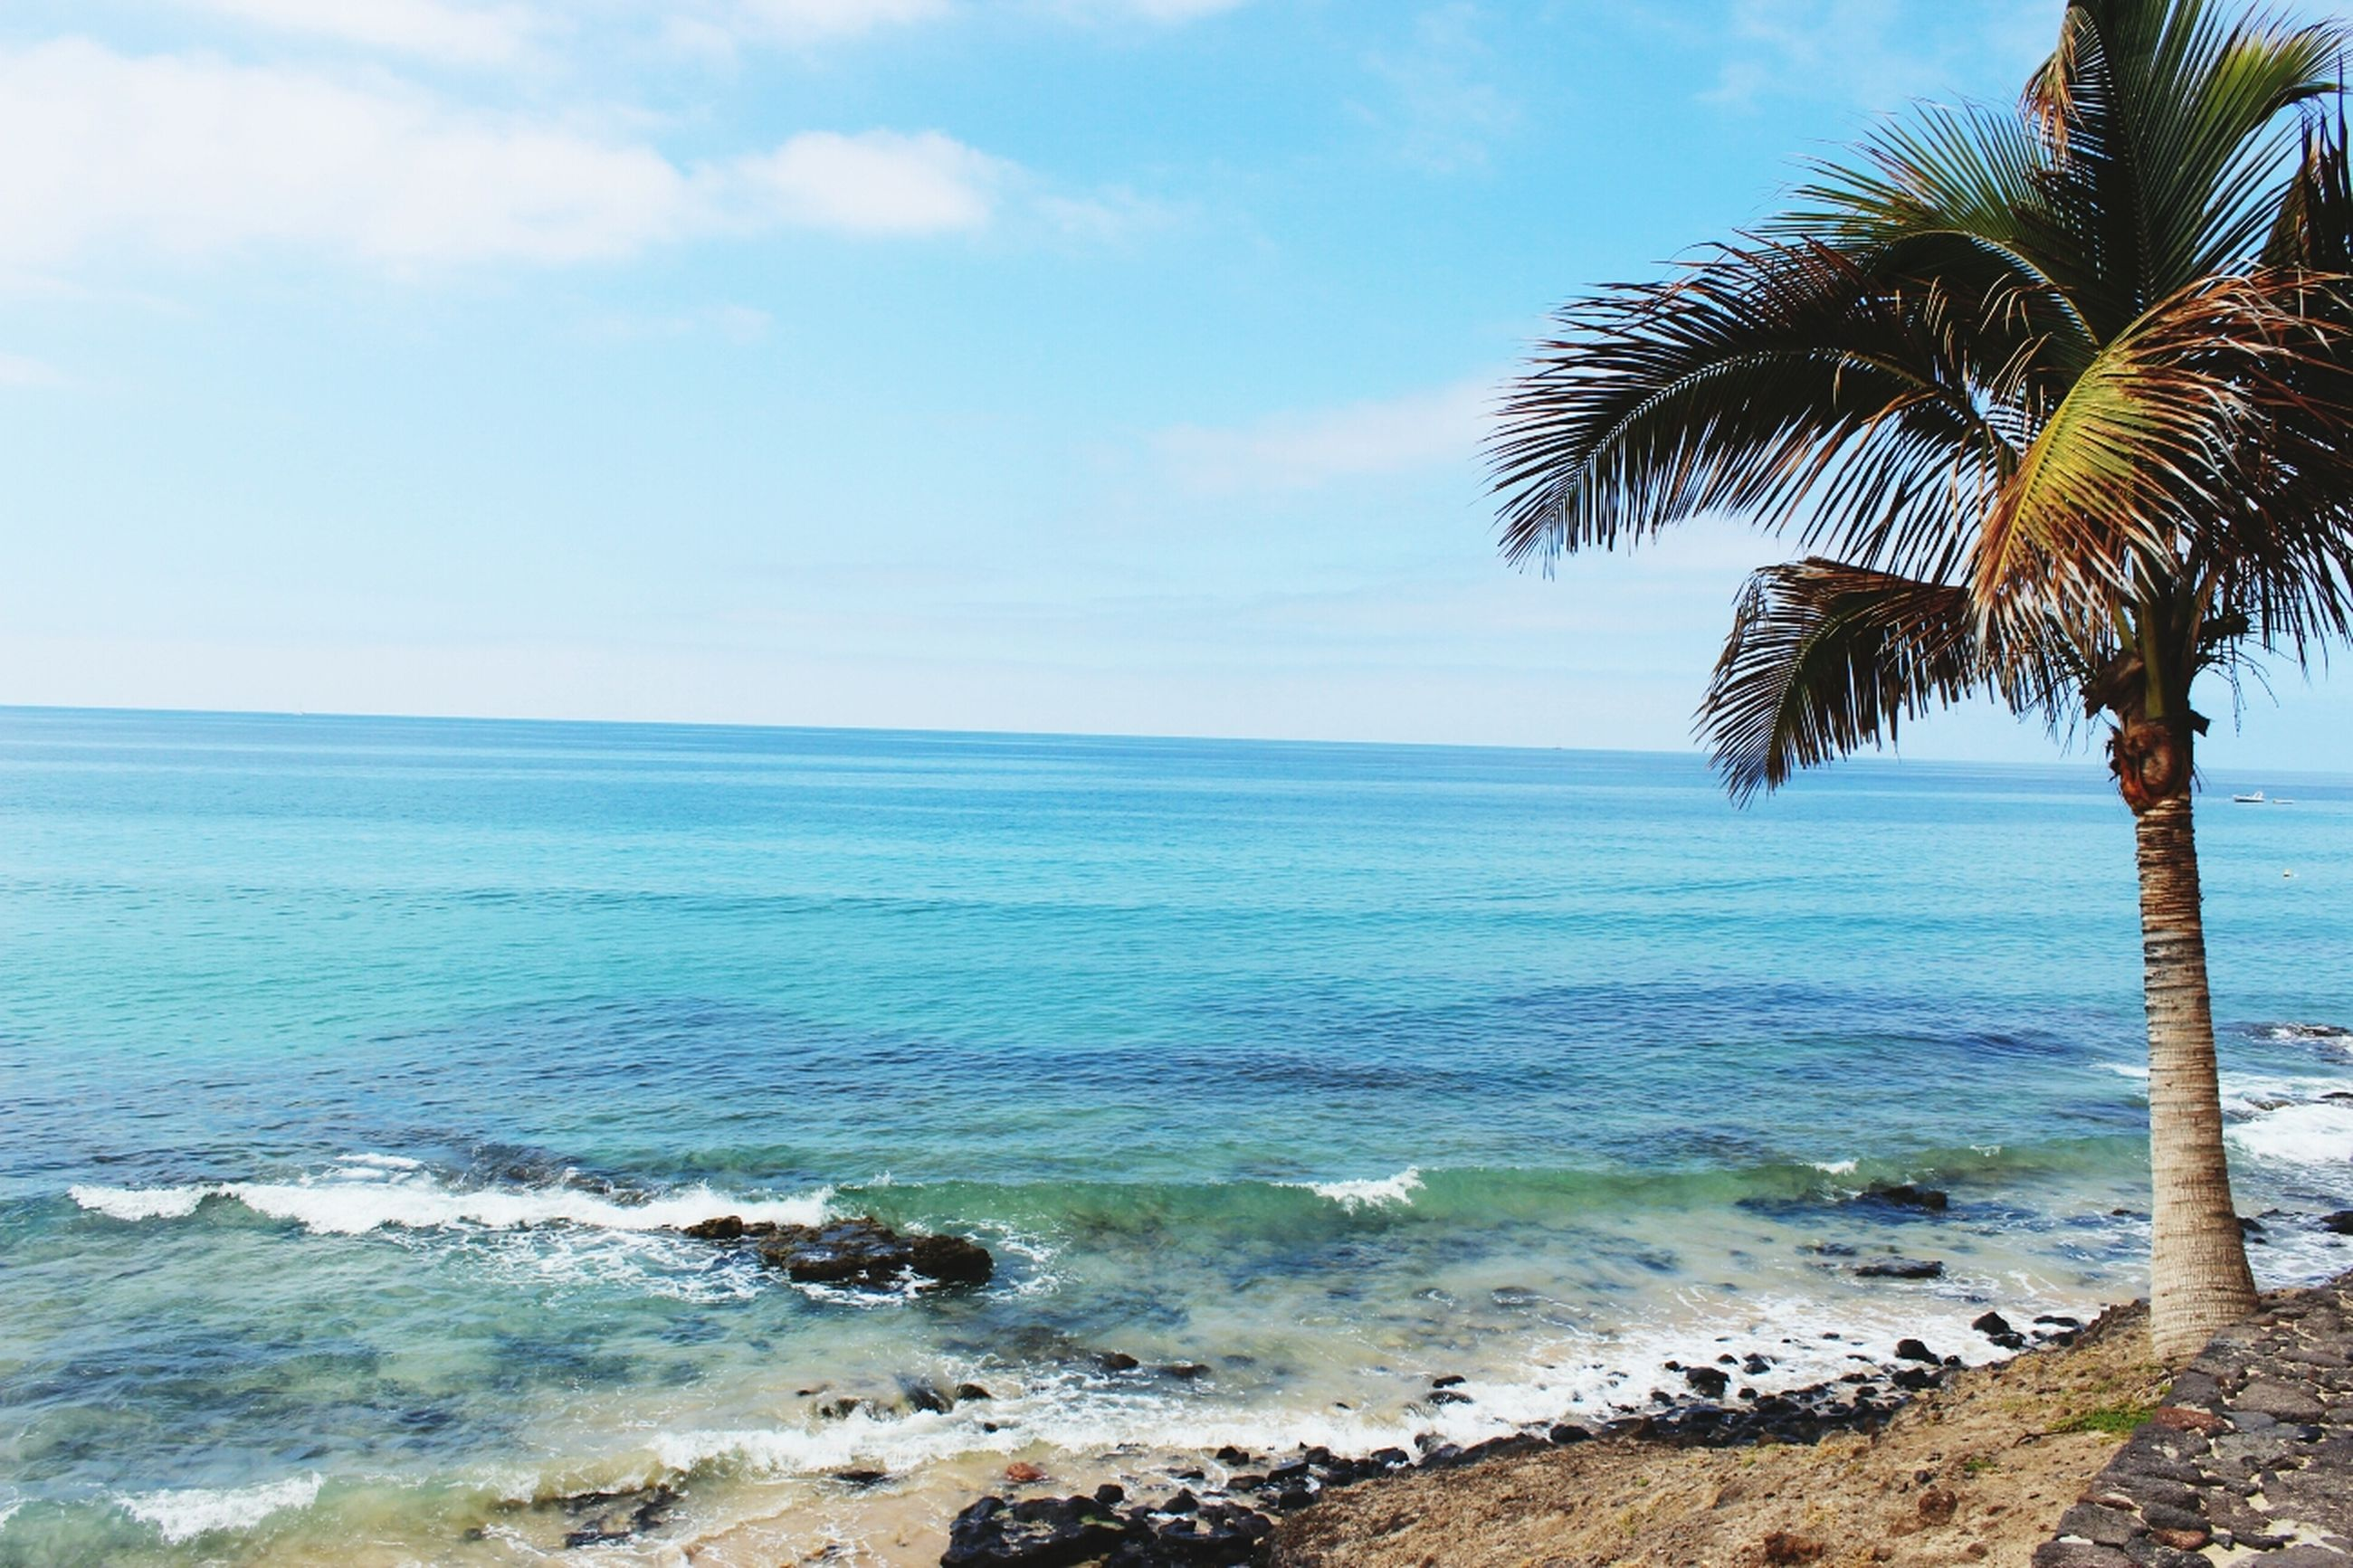 sea, beach, water, horizon over water, tranquility, tranquil scene, scenics, palm tree, sky, shore, beauty in nature, tree, nature, sand, idyllic, coastline, wave, day, outdoors, non-urban scene